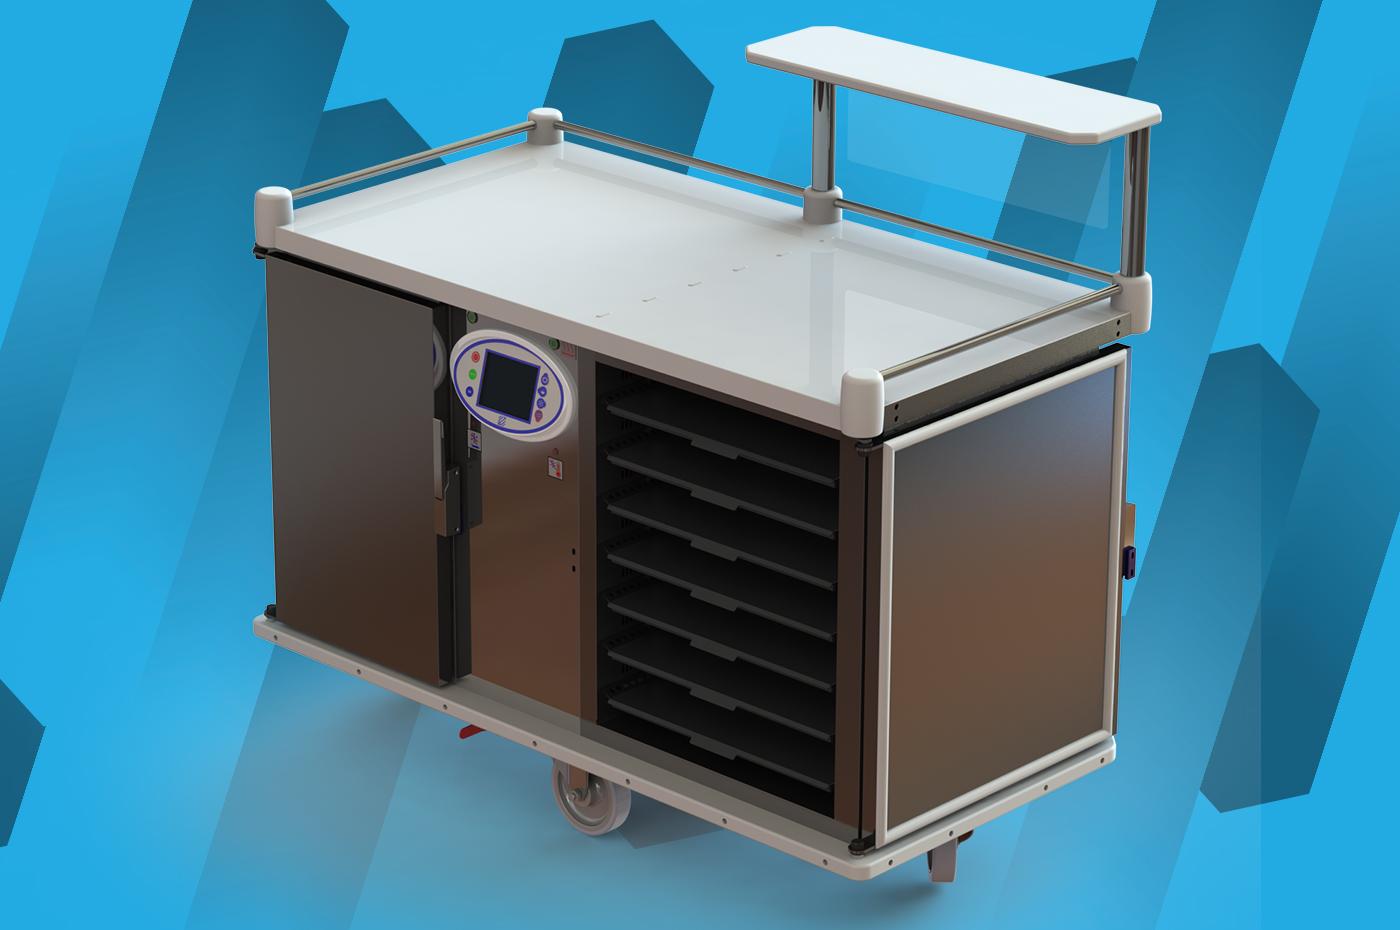 Chariot de distribution de repas Restiself 4G